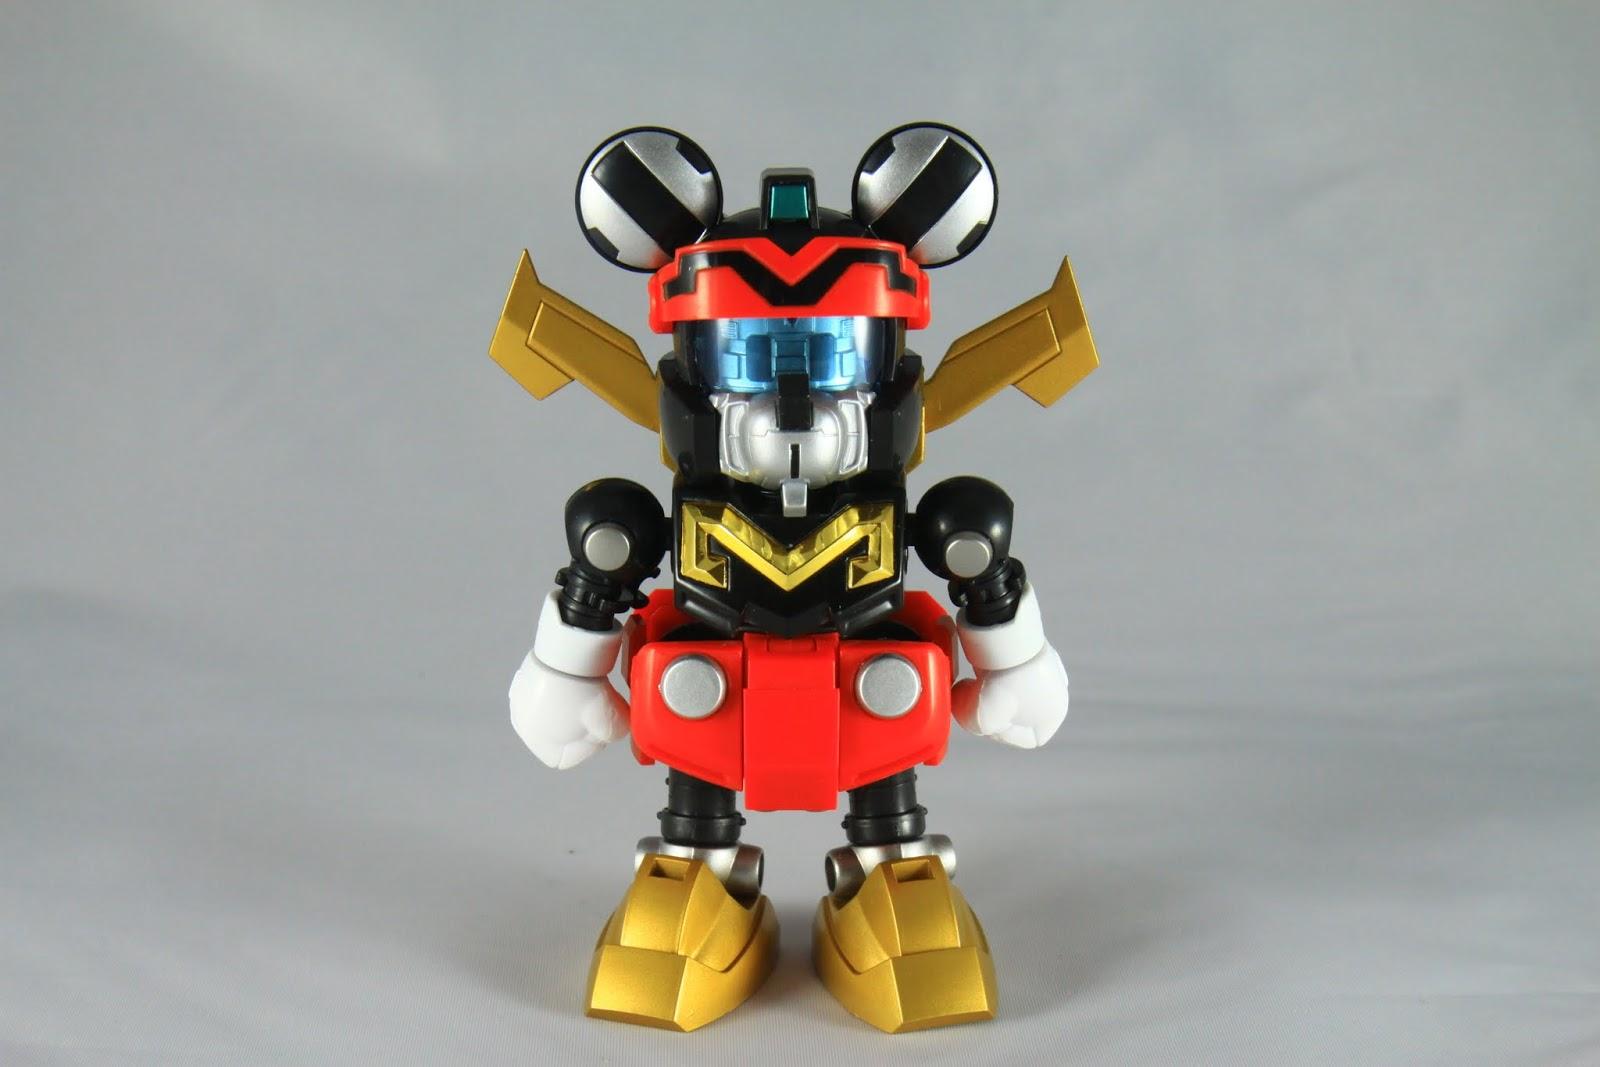 Jet Mickey- 噴射米奇 米奇要噴射了~(笑) 駕駛人當然是米奇老鼠啦~ 外觀都是仿原角色設計的 所以應該不會發生認不出誰是誰的問題